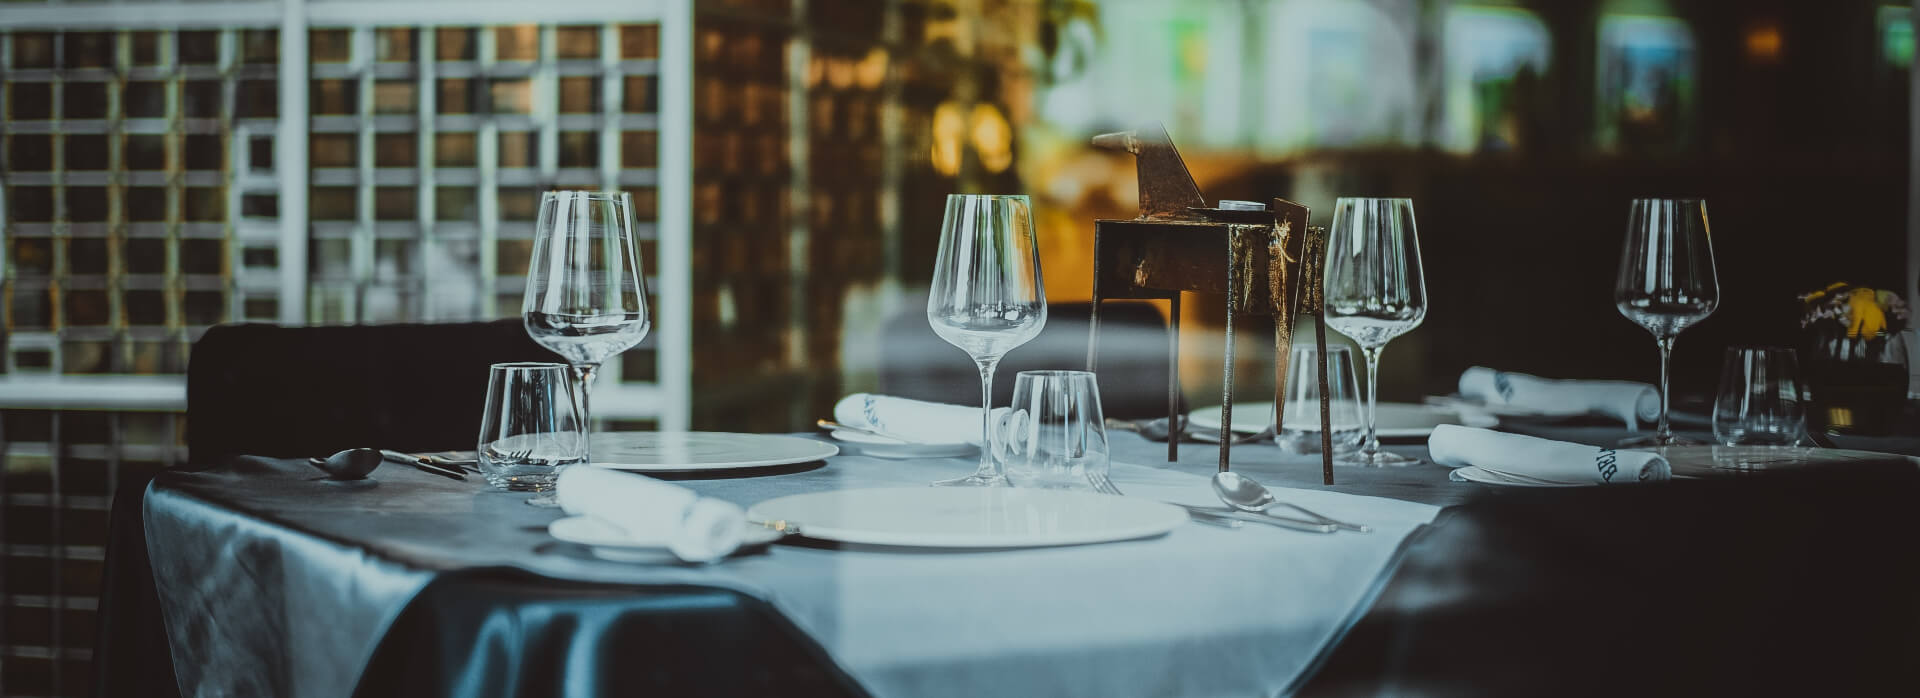 Restaurant Tableware